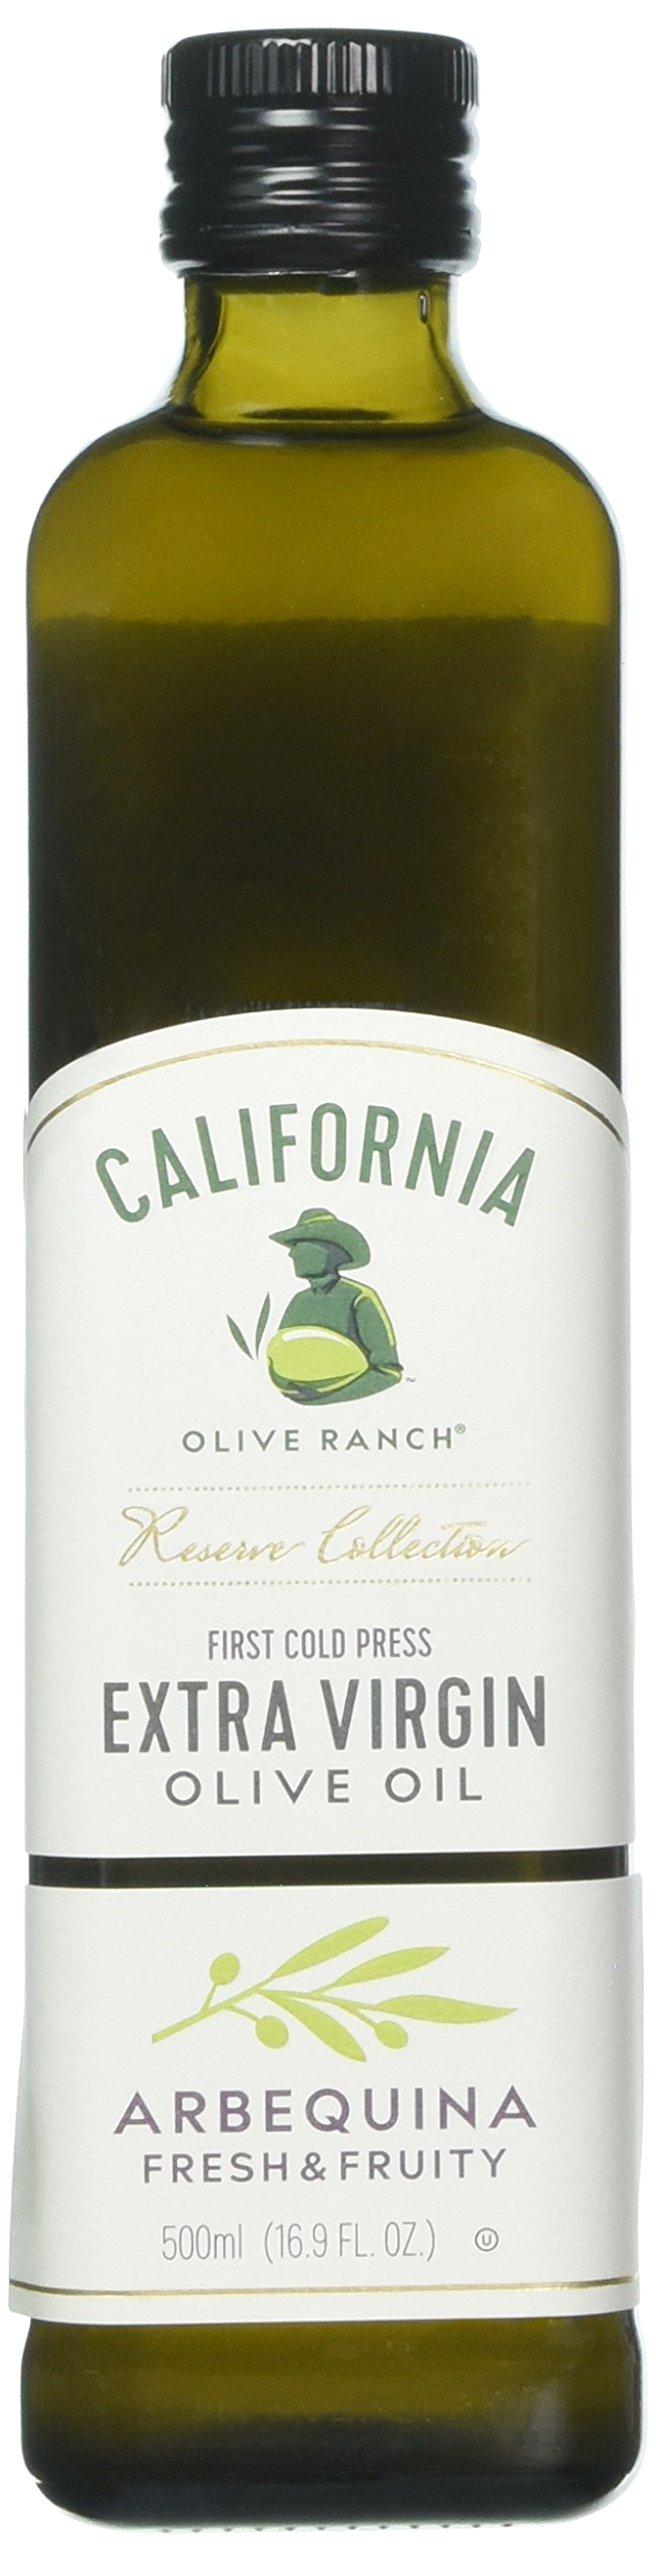 California Olive Ranch Arbequina Extra Virgin Olive Oil, 16.9 Fl Oz by California Olive Ranch